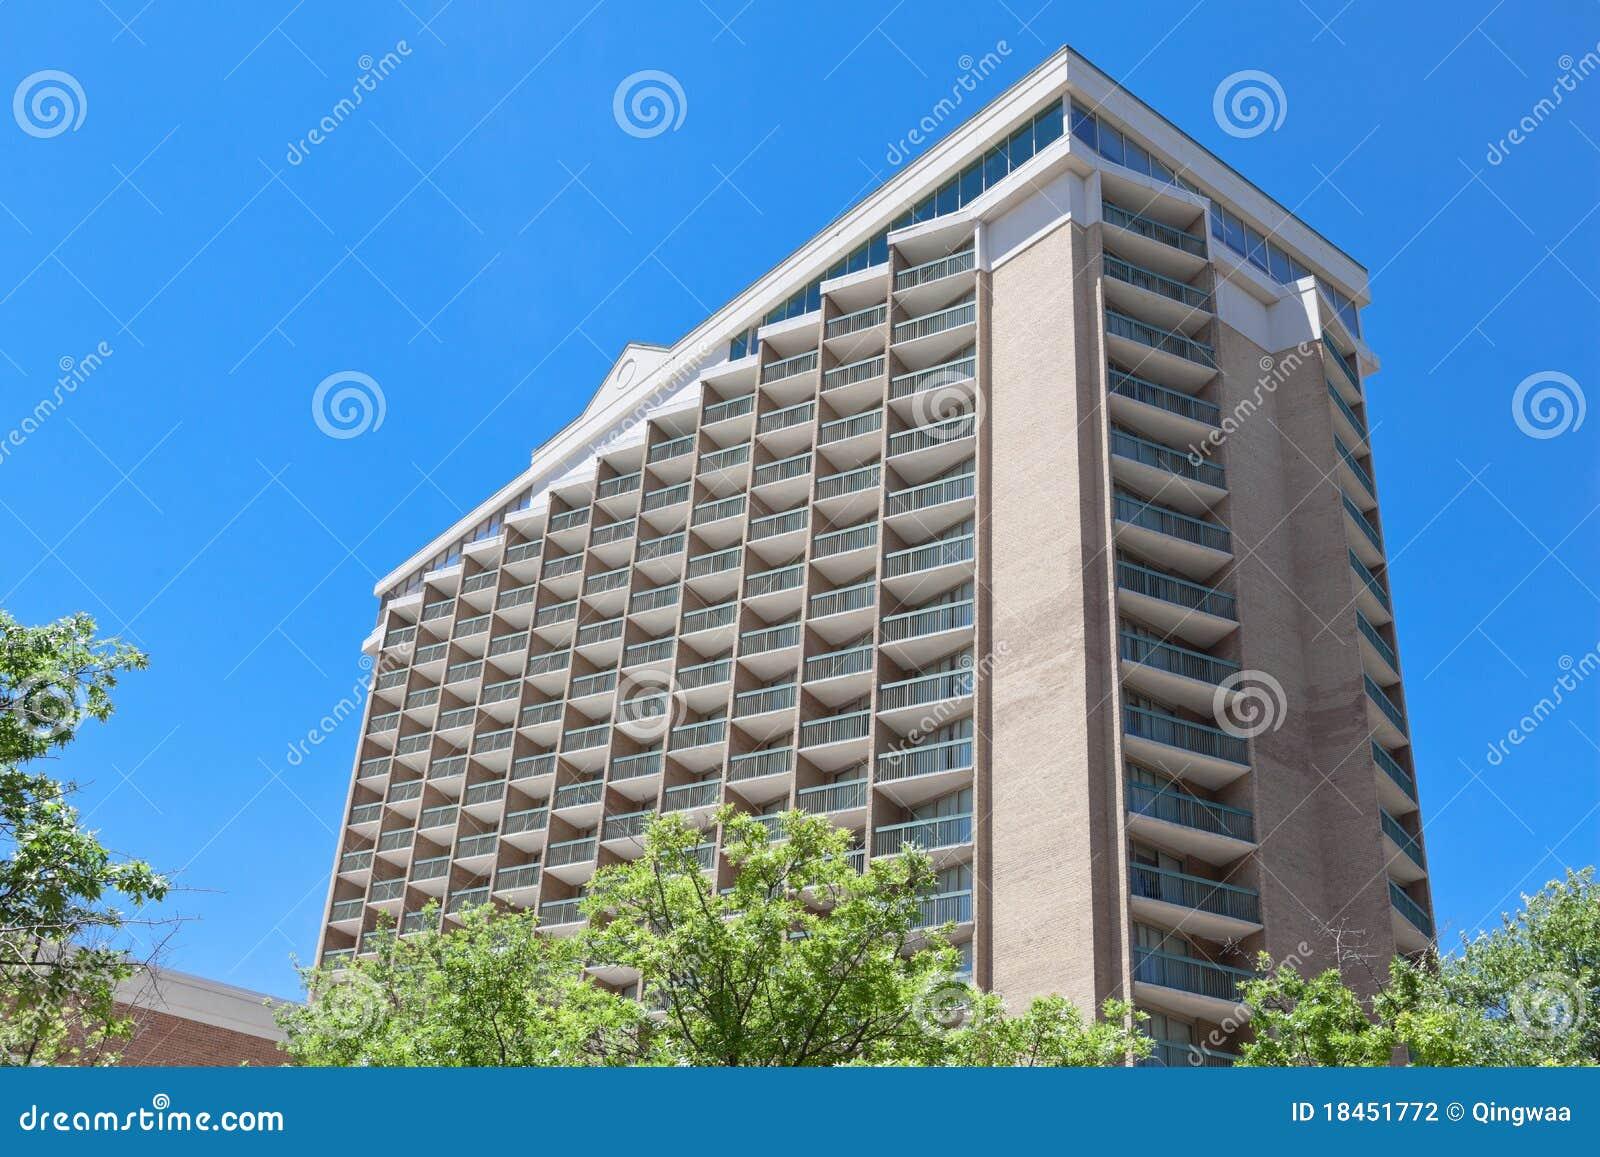 Apartment Buildings In Rosslyn Va